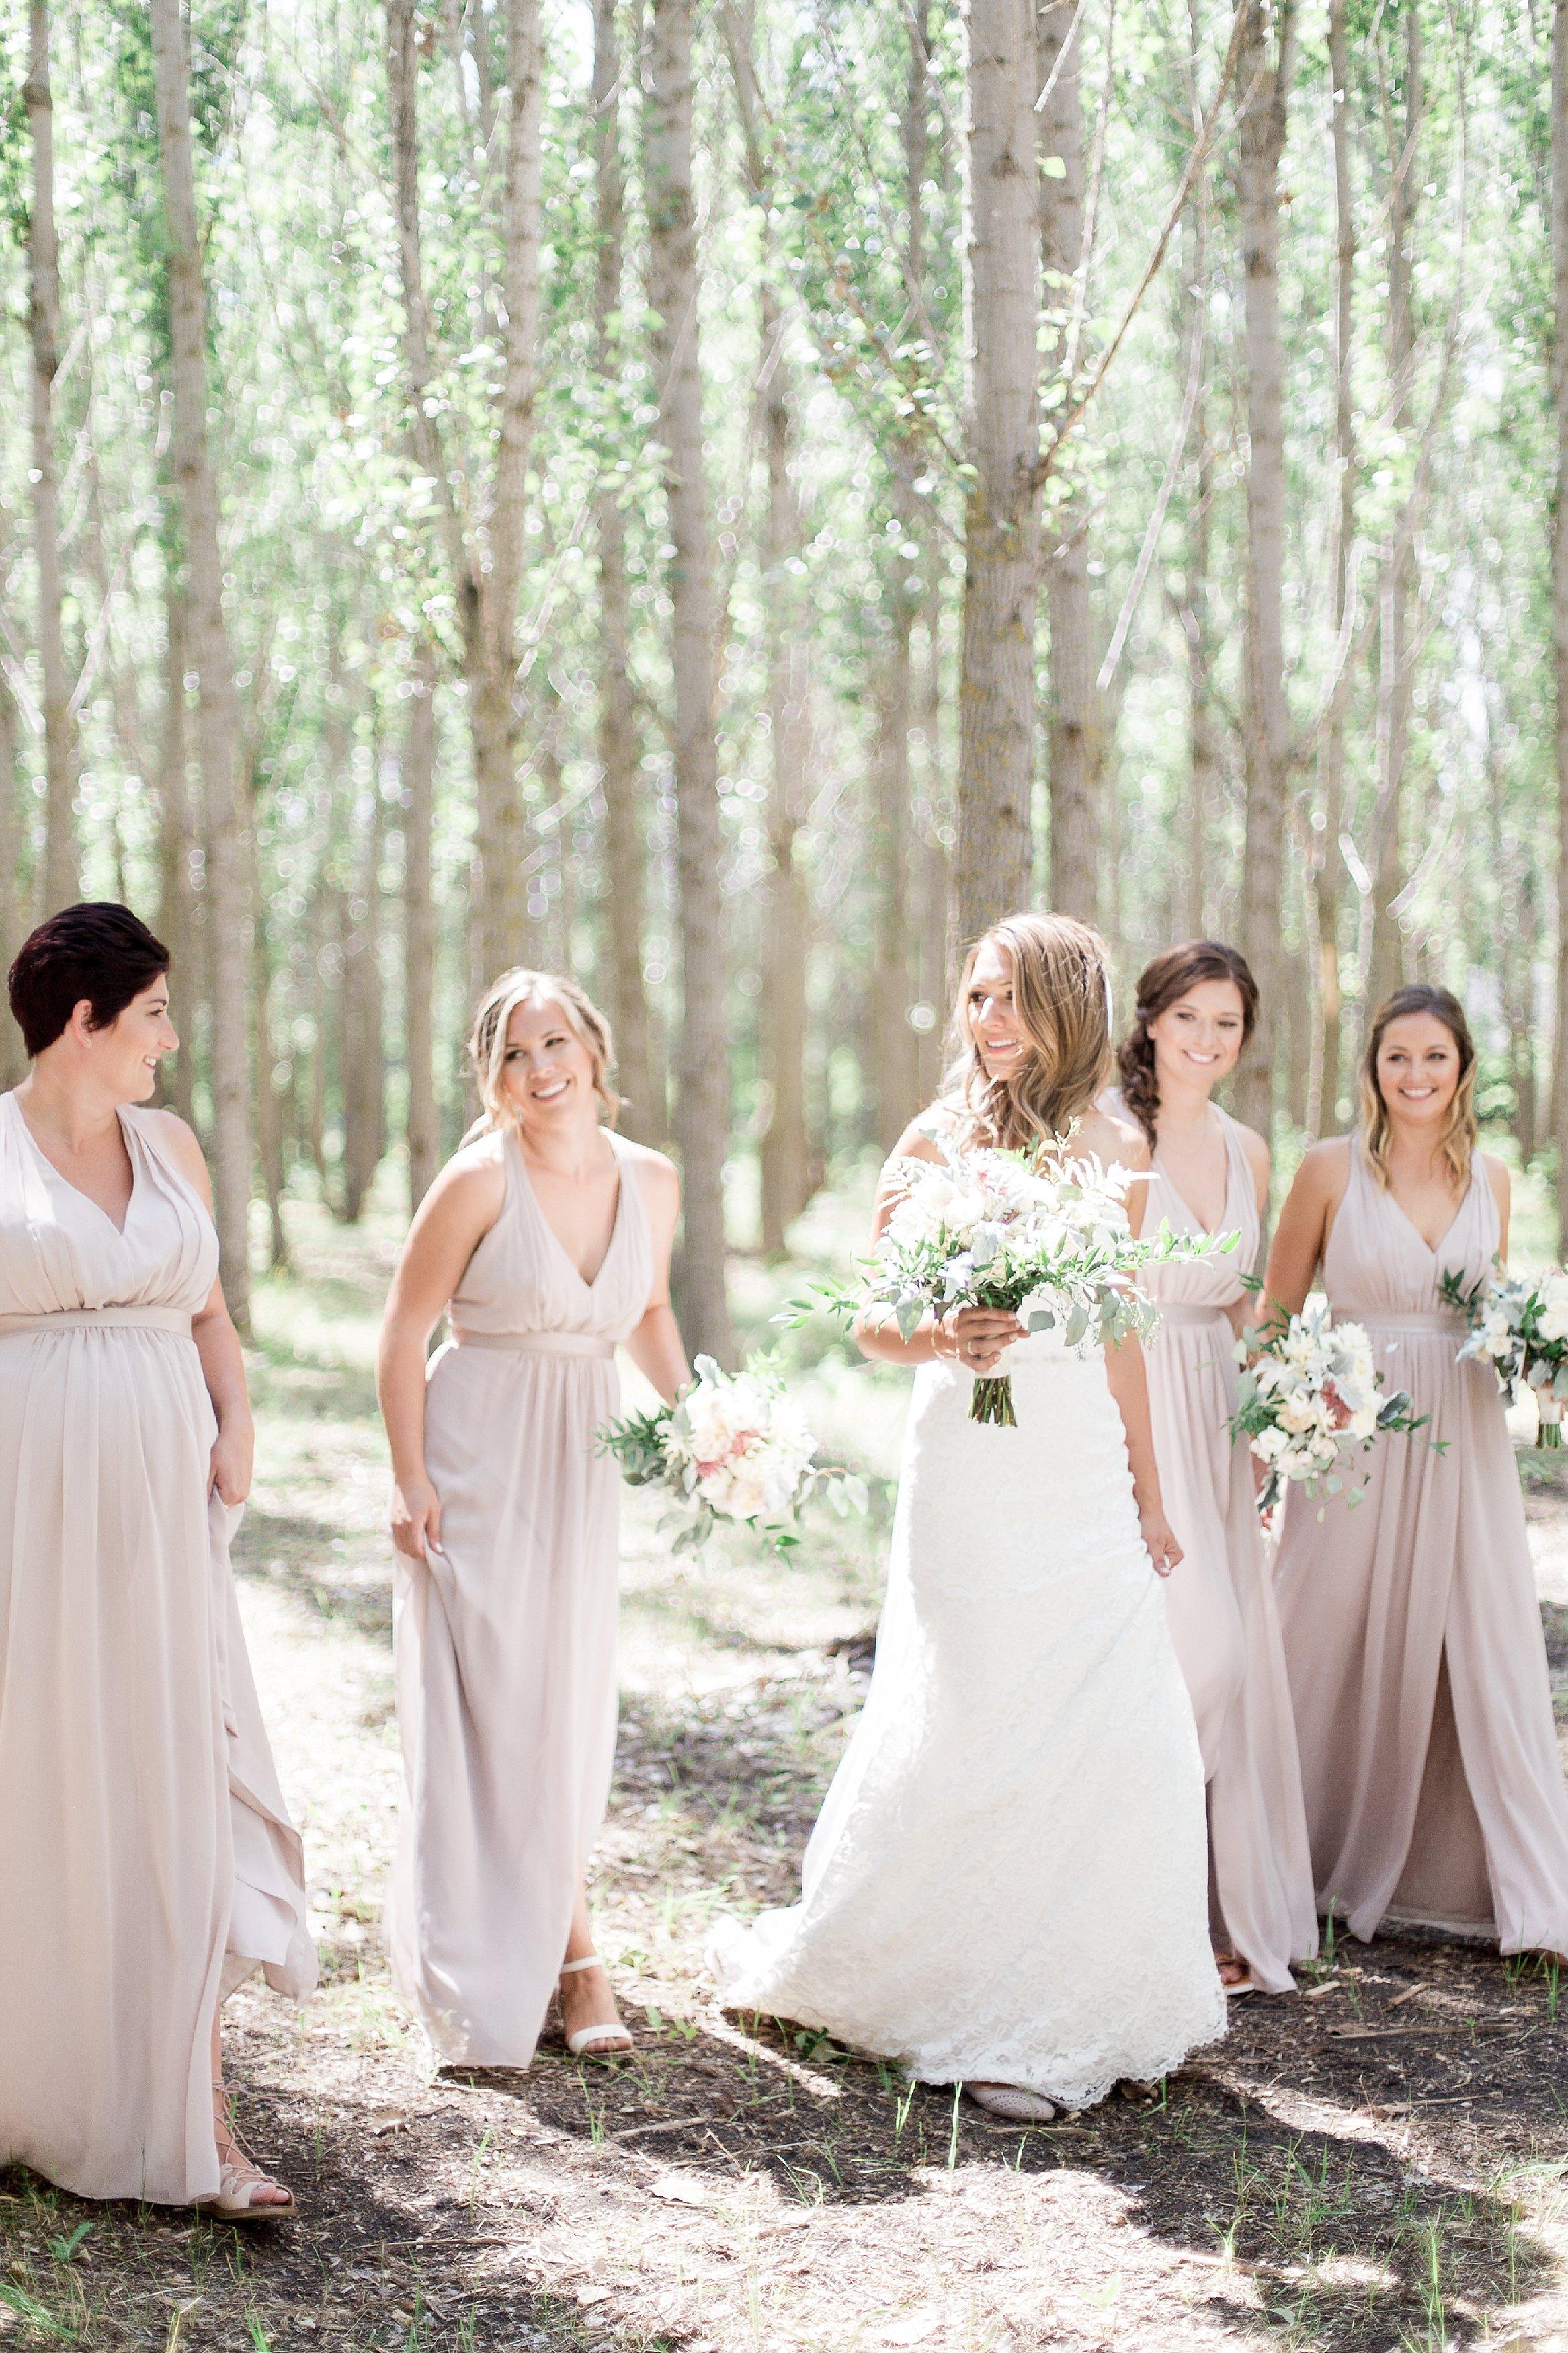 Winnipeg and Vancouver Wedding Photographer film photographer Keila Marie Photography   Bridesmaids photos   bridesmaid blush dresses